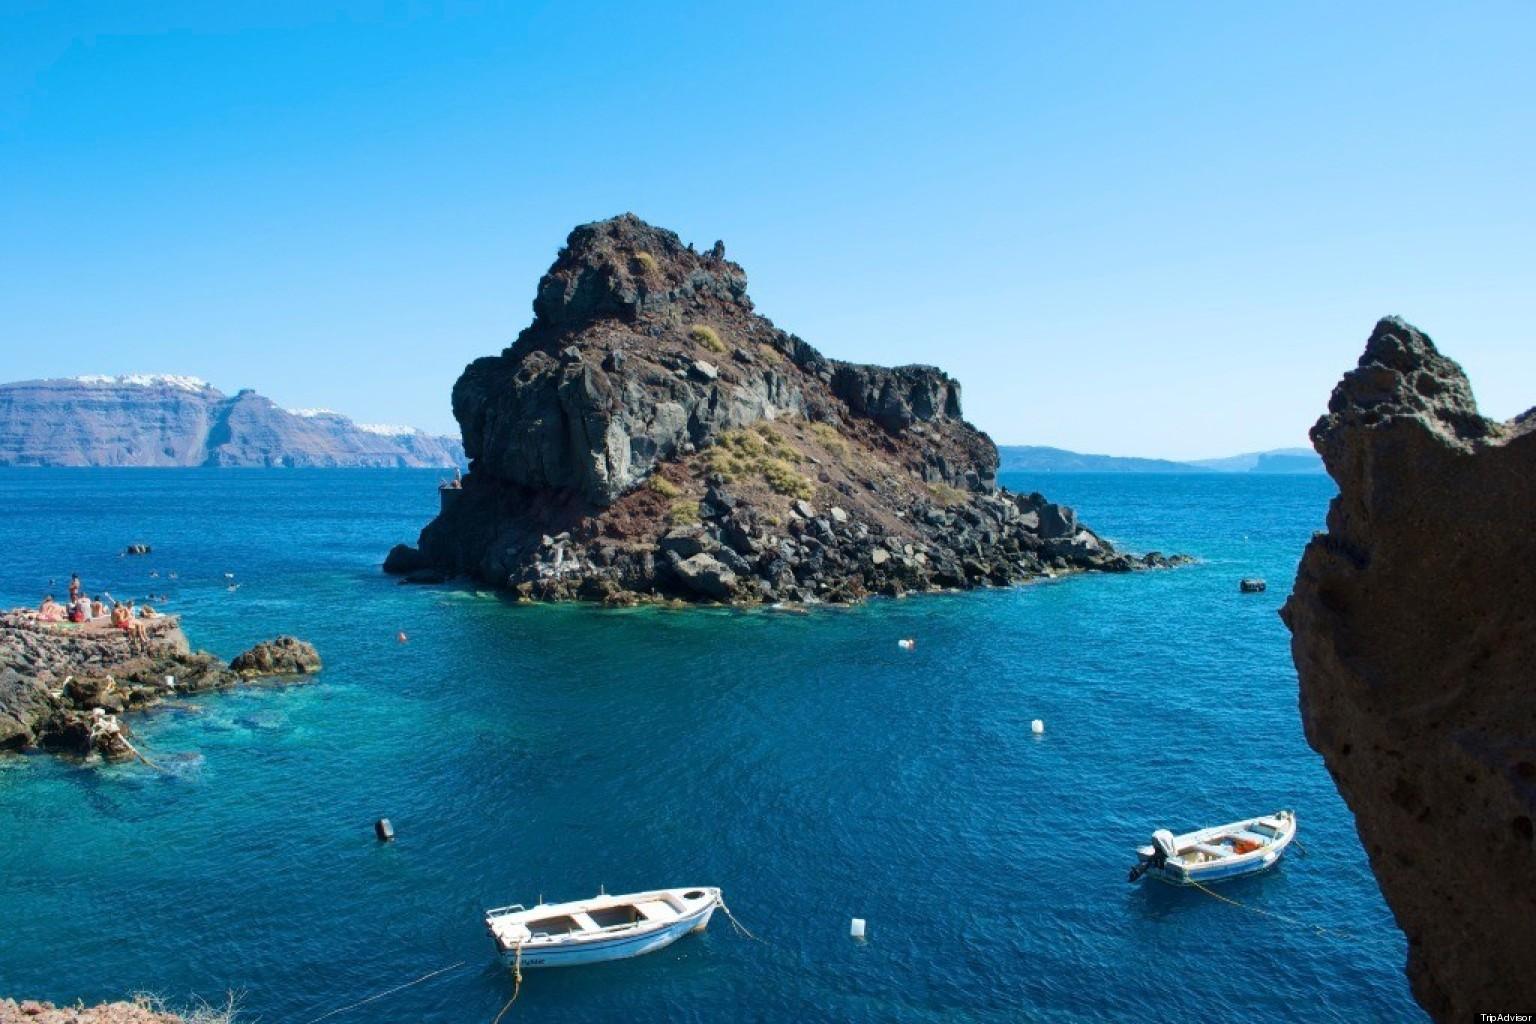 The 10 Best Islands In The World According To Tripadvisor